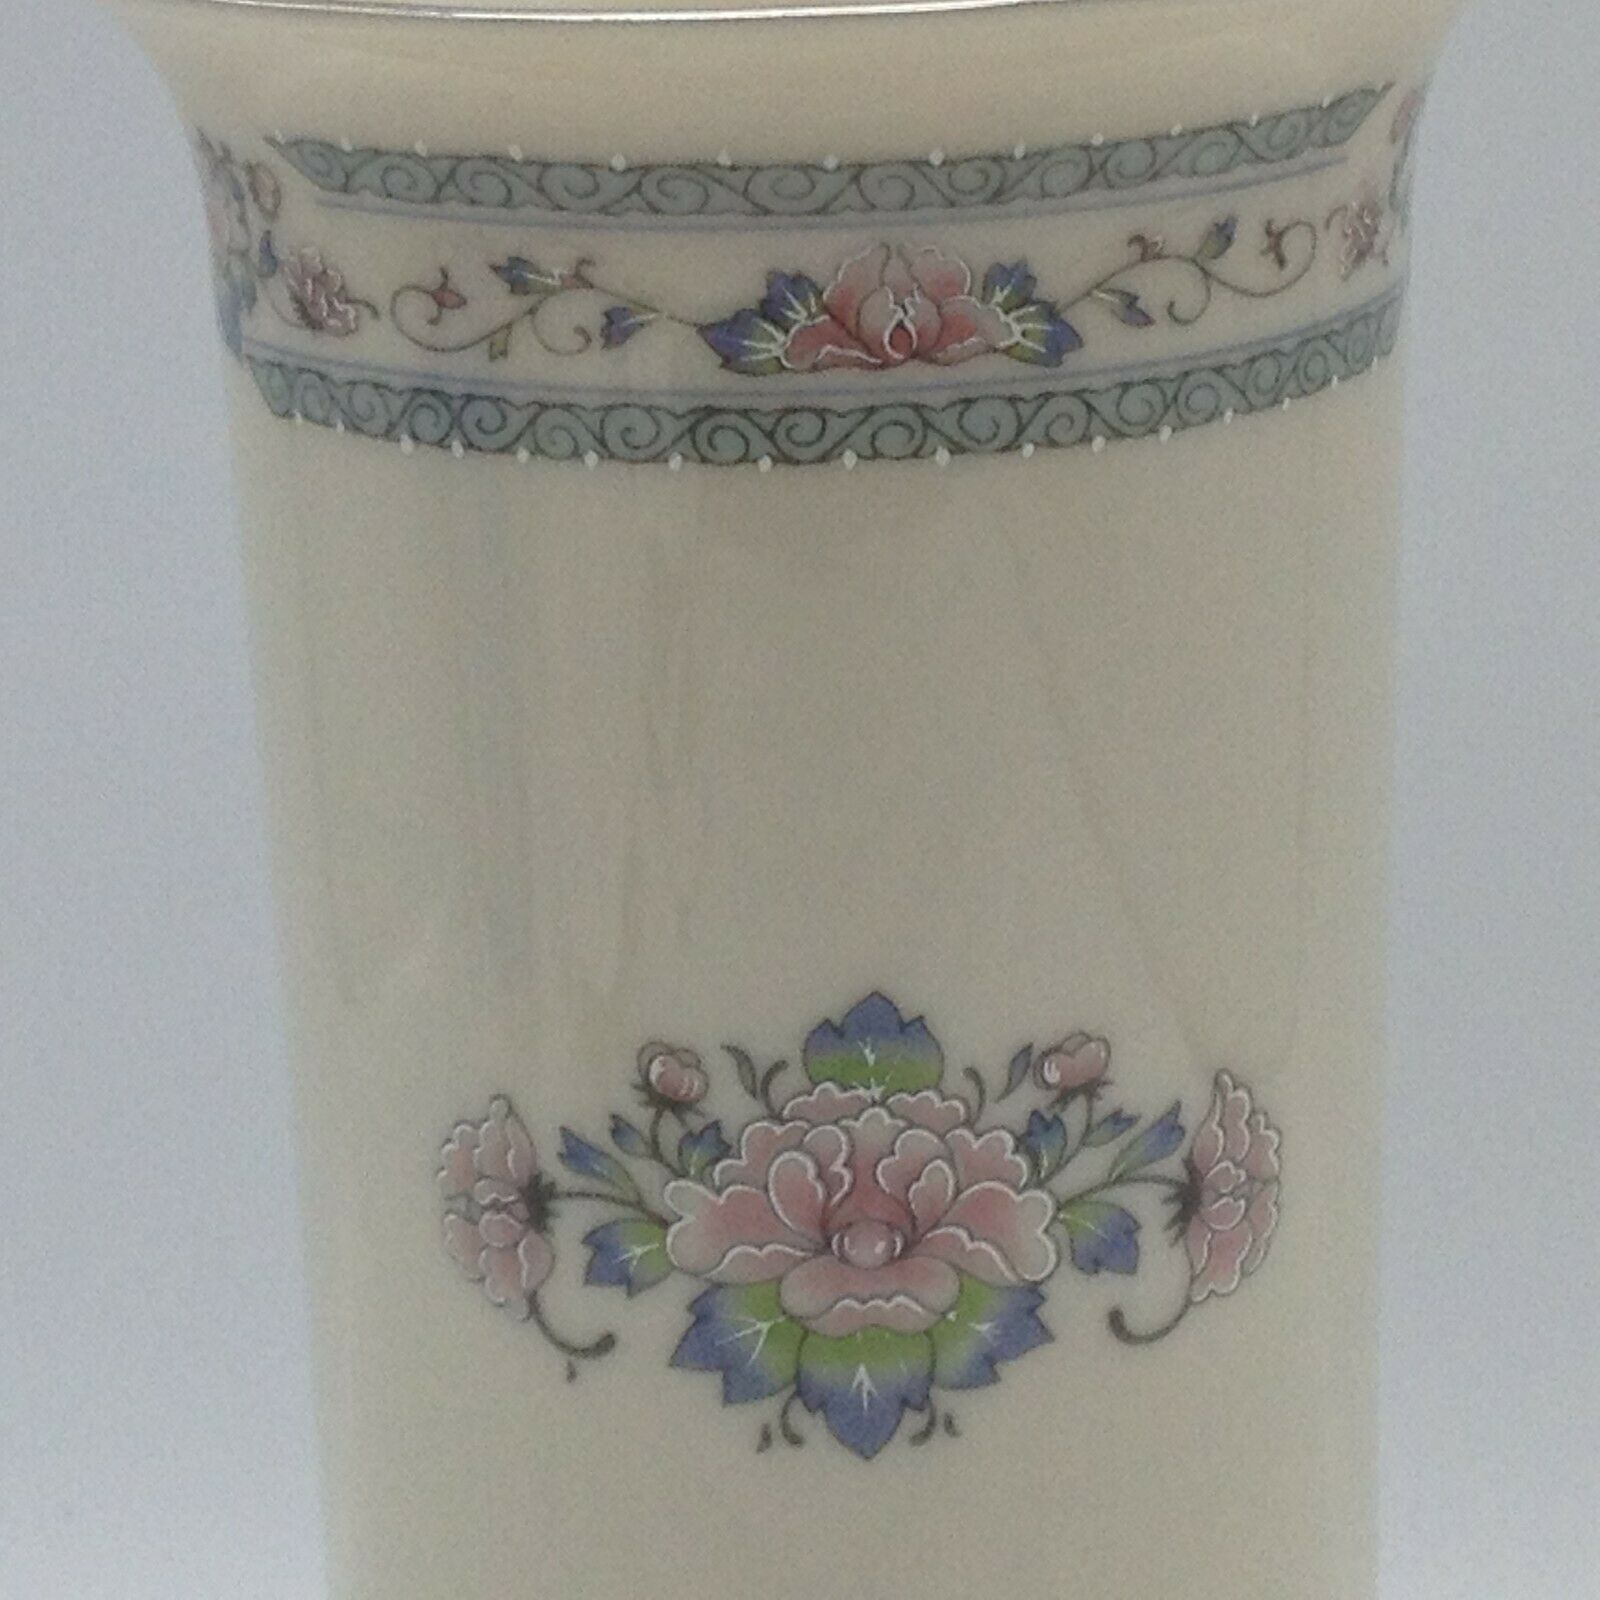 LENOX VASE Charleston Pattern Fine Porcelain Made in USA Excellent Cond Floral